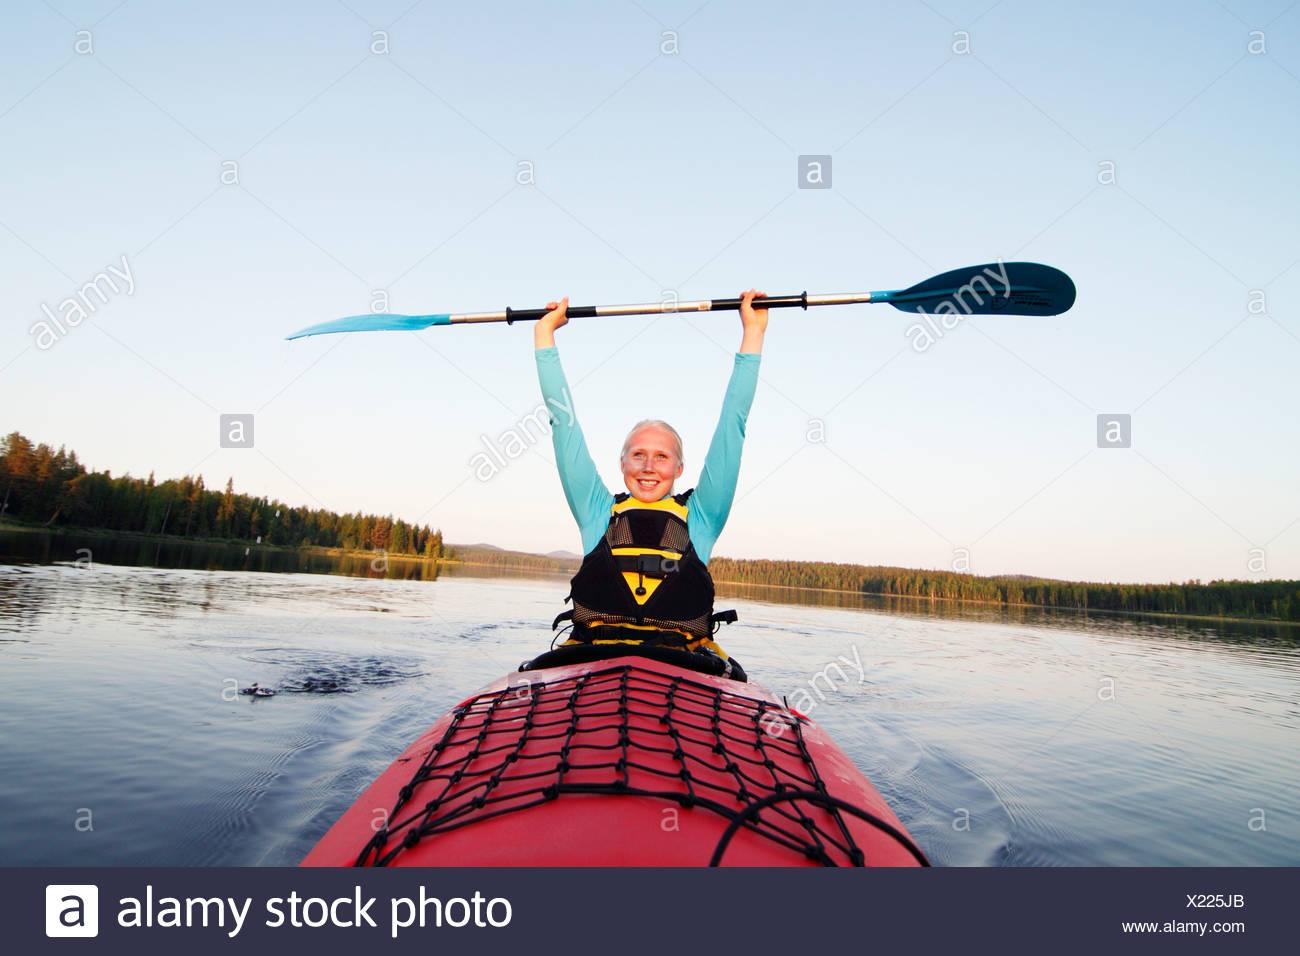 Smiling woman holding paddle Photo Stock